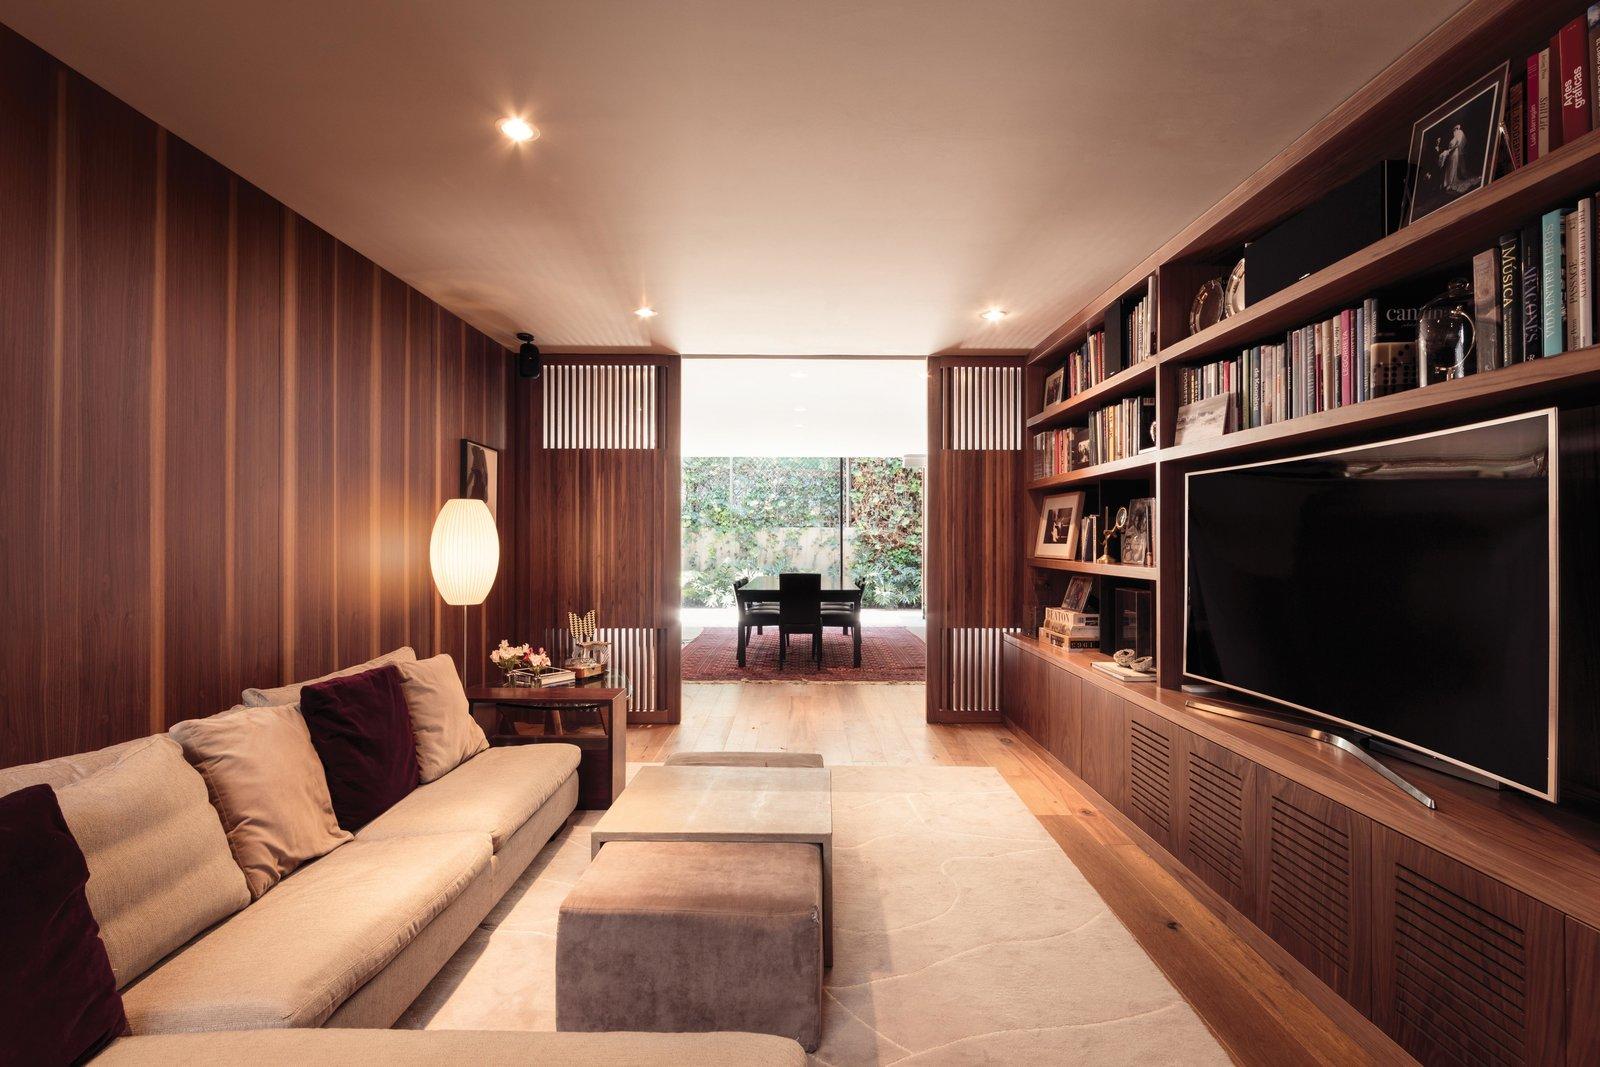 Living Room, Sofa, Coffee Tables, and Medium Hardwood Floor SIERRA FRIA  Photos from Sierra Fria